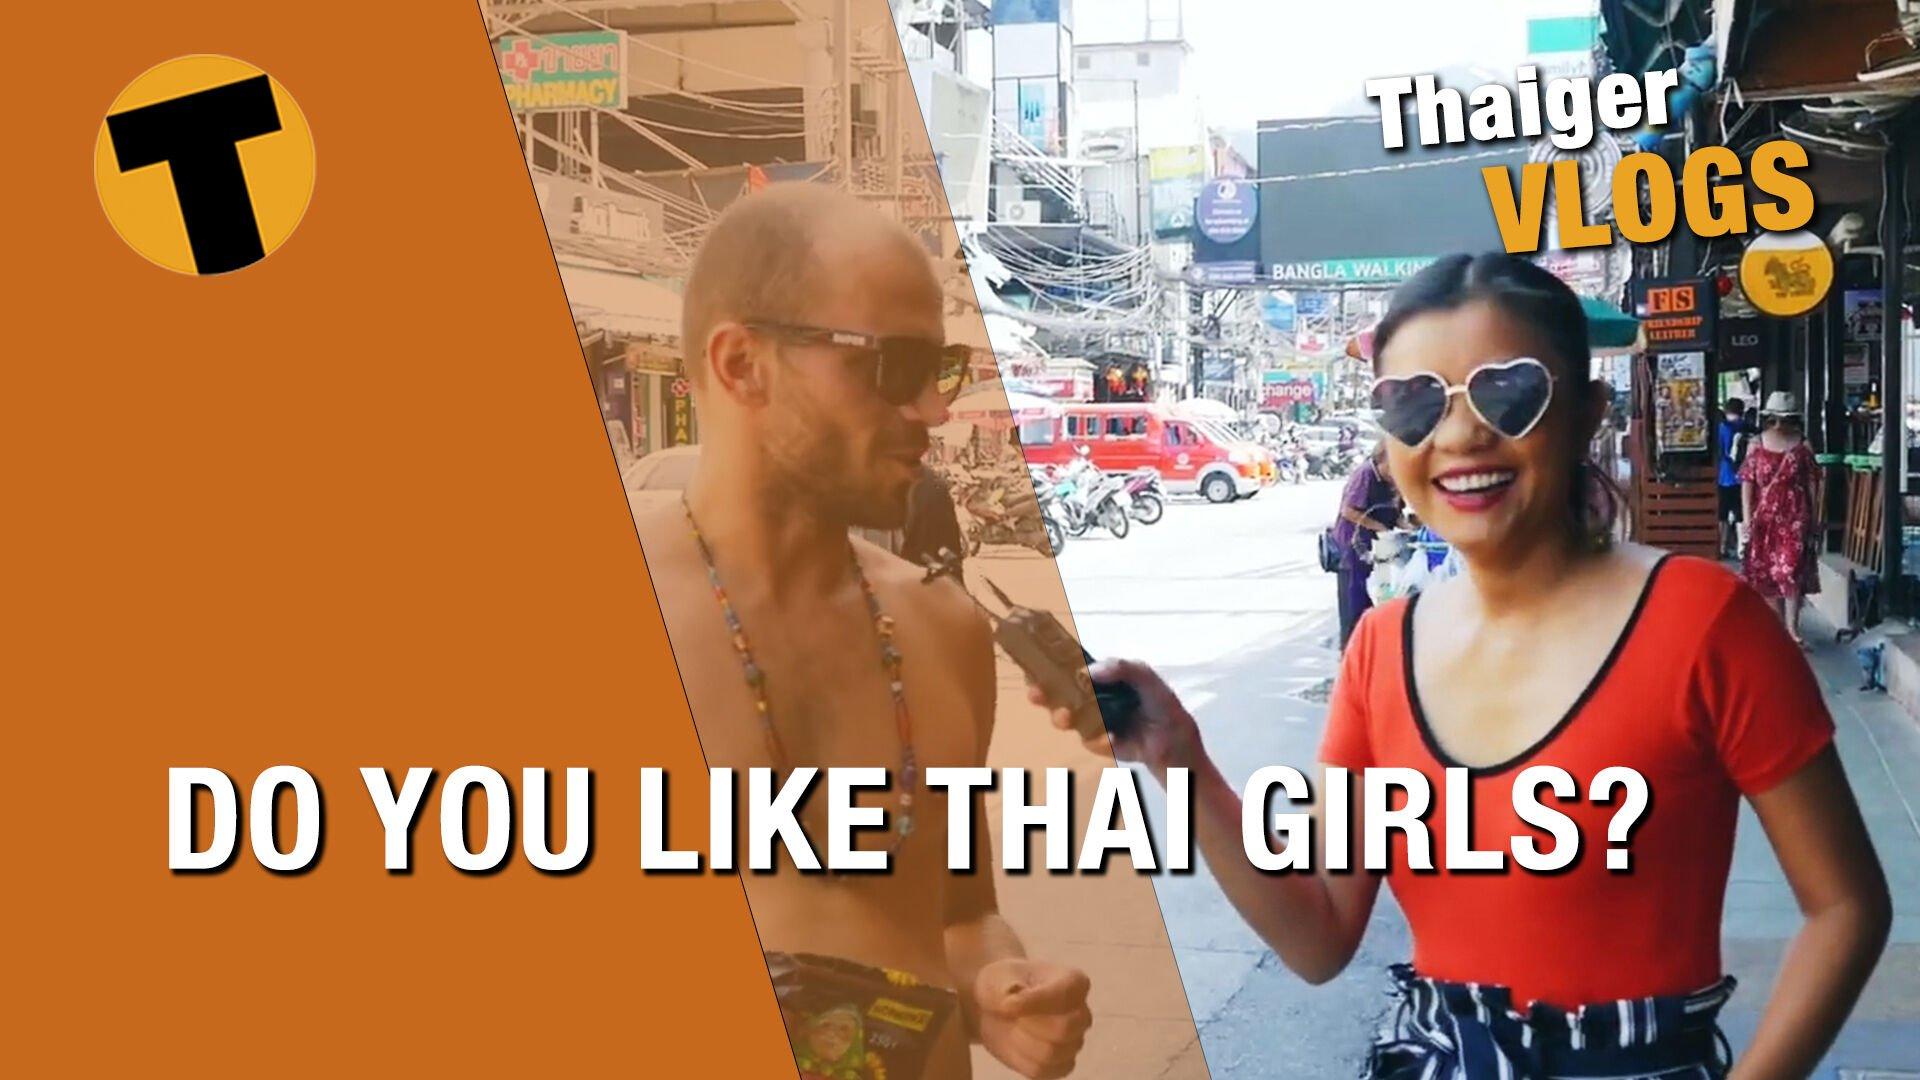 Why do foreign men like Thai women? A Thaiger vlogger